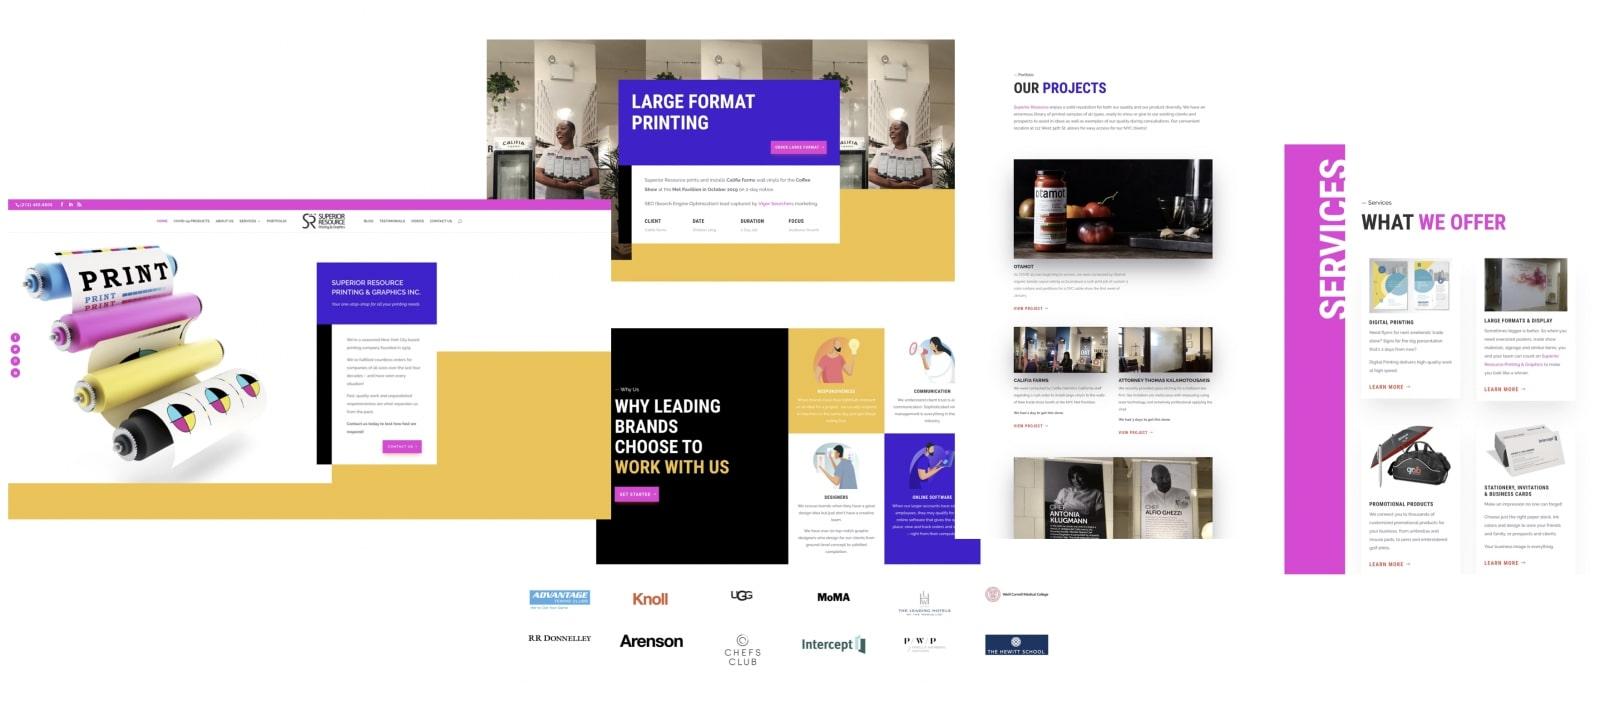 Superior-resource-website